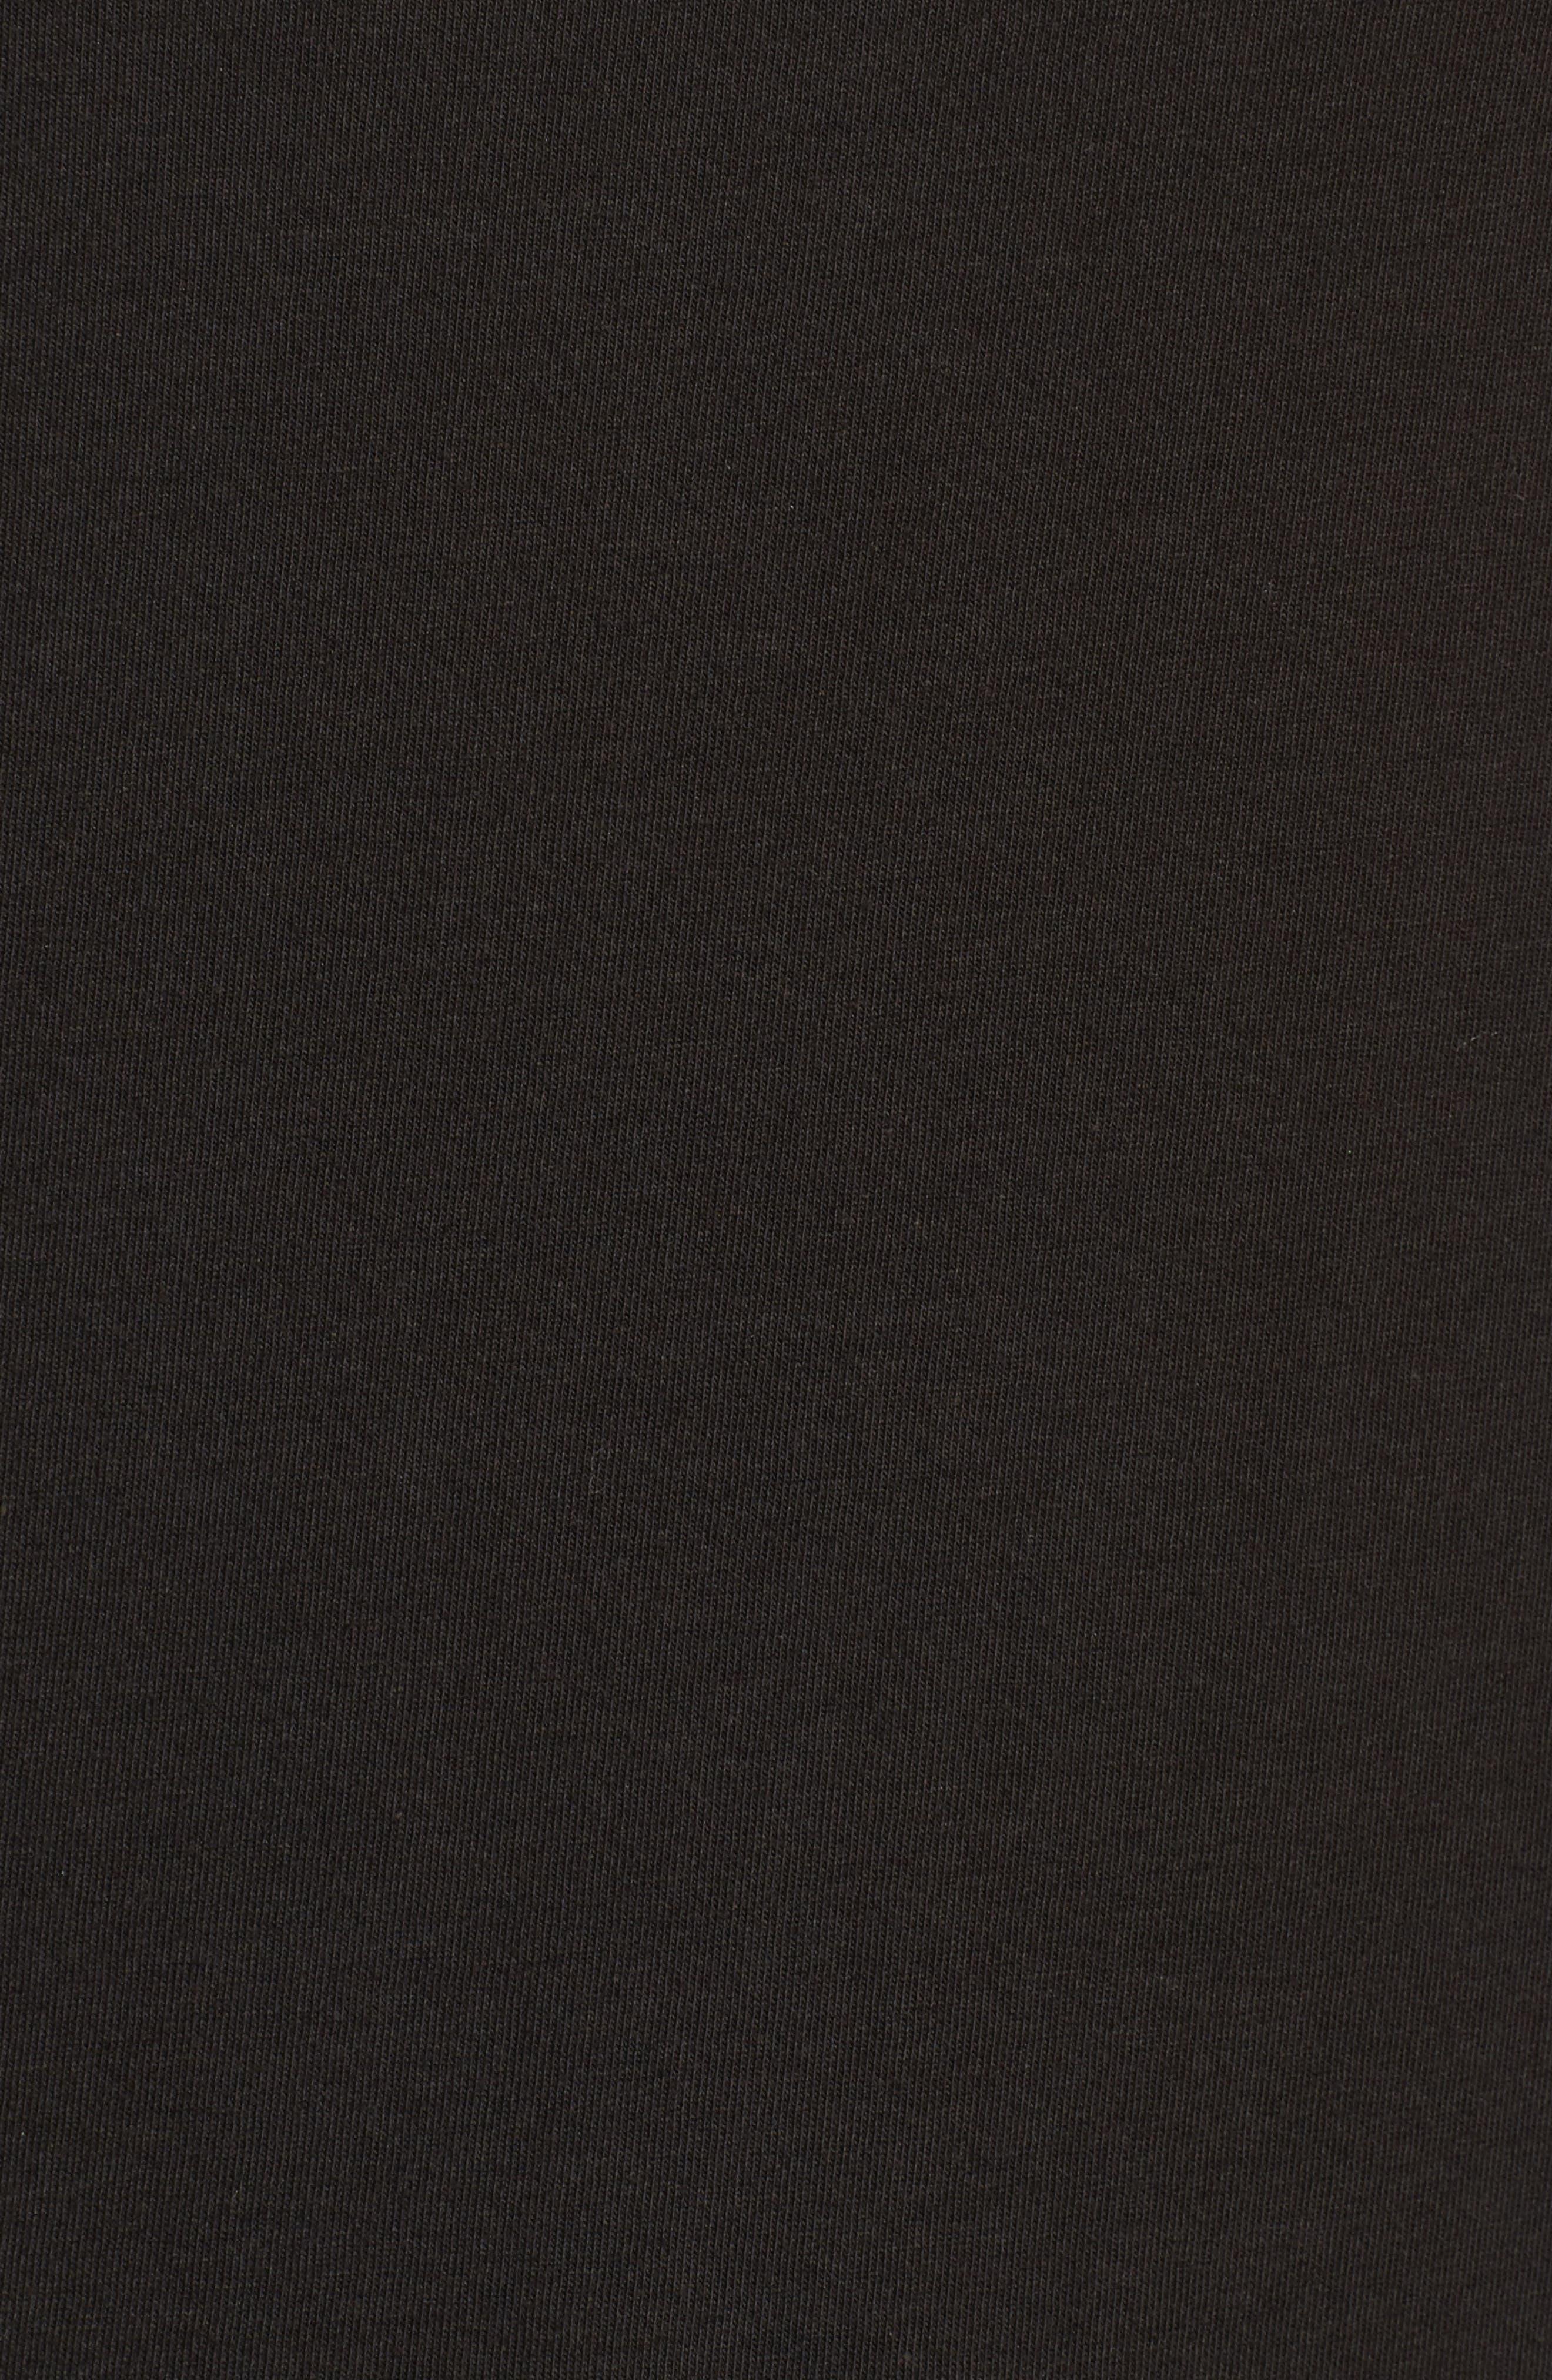 Sid Singlet Tank,                             Alternate thumbnail 6, color,                             Plain Black Marle